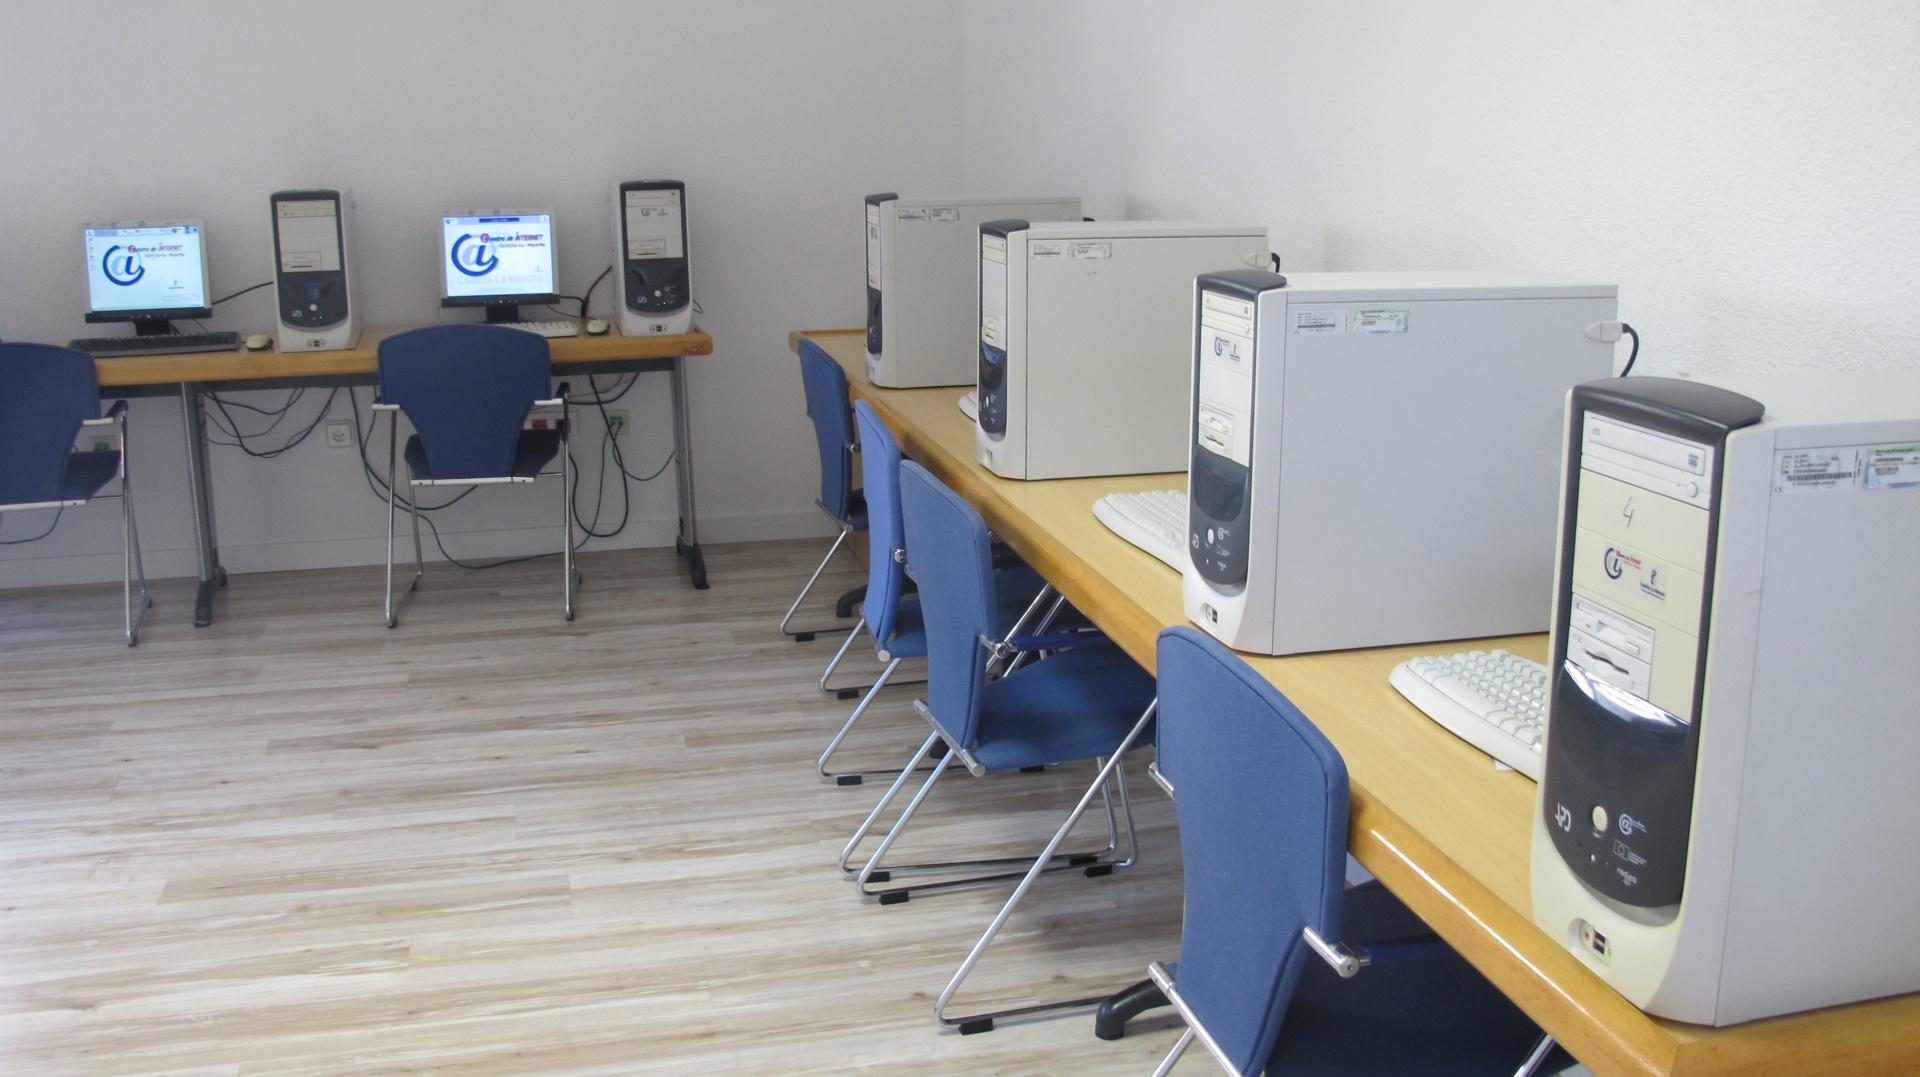 'Aula informática Biblioteca de Cabanillas'